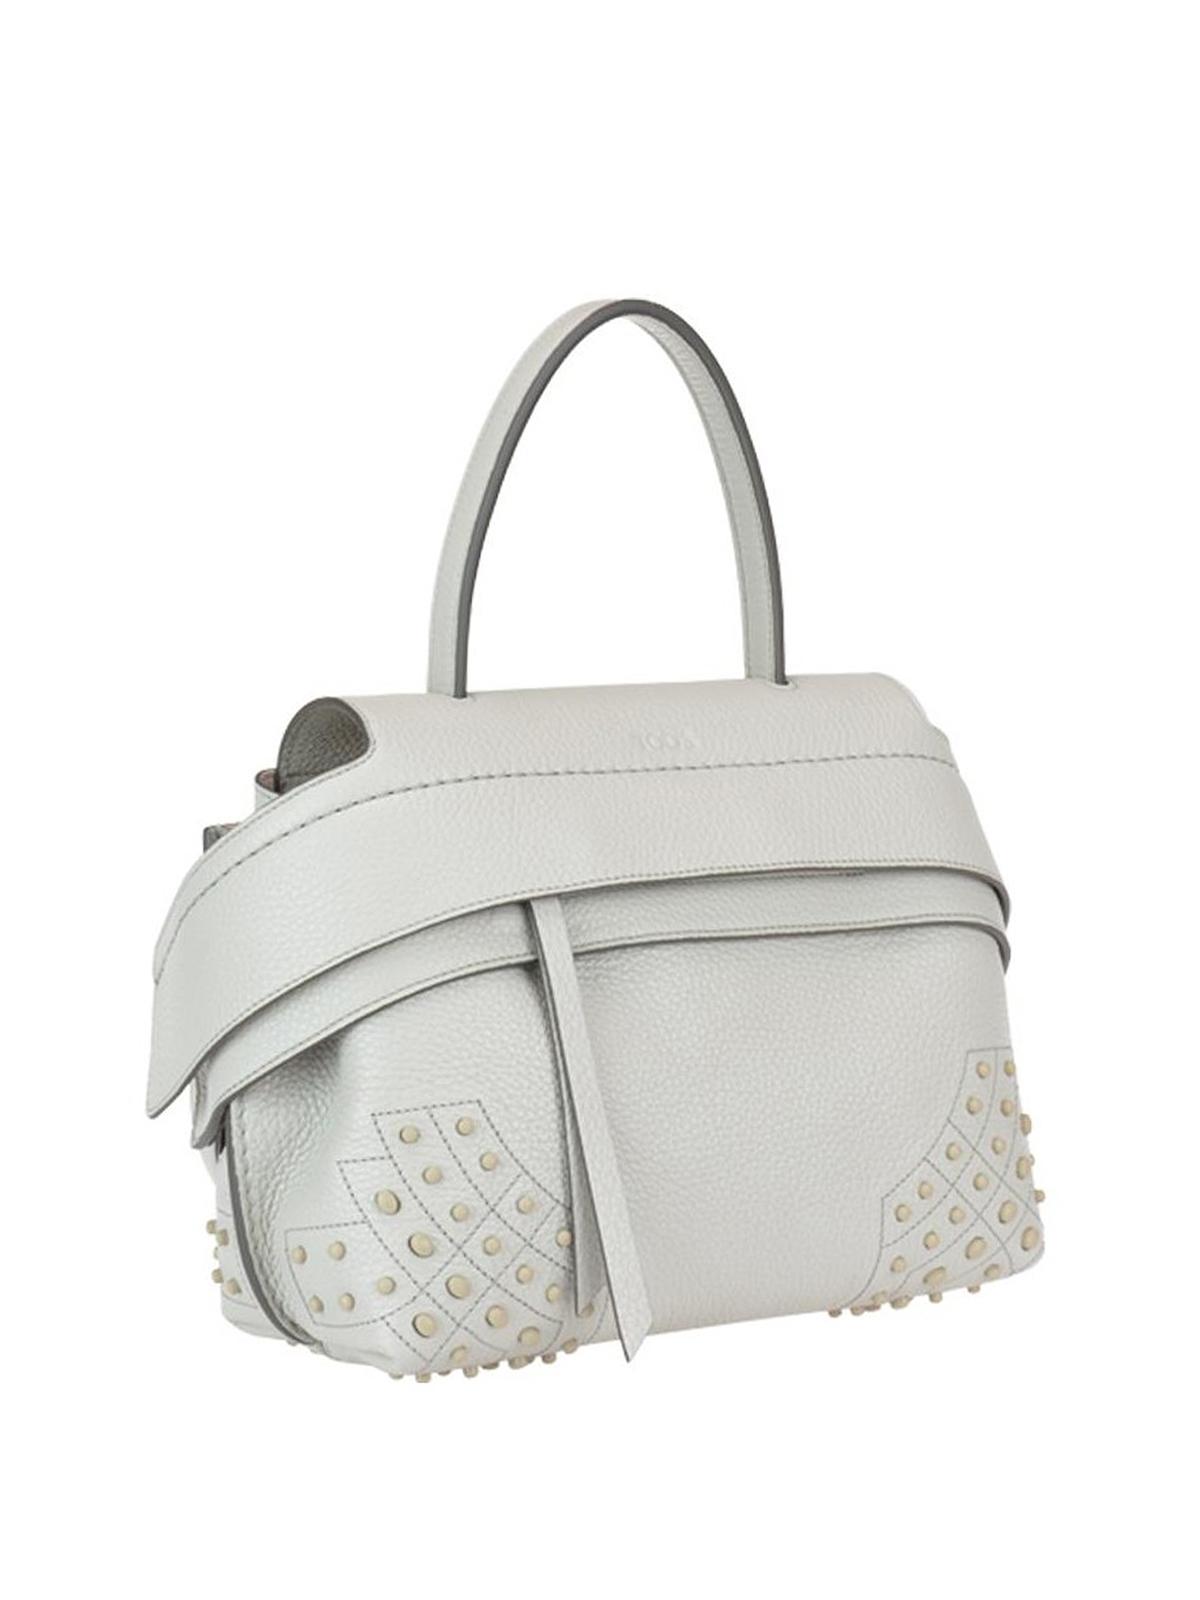 96aae533e6e Wave white leather mini shoulder bag shop online: TOD. TOD. TOD. TOD